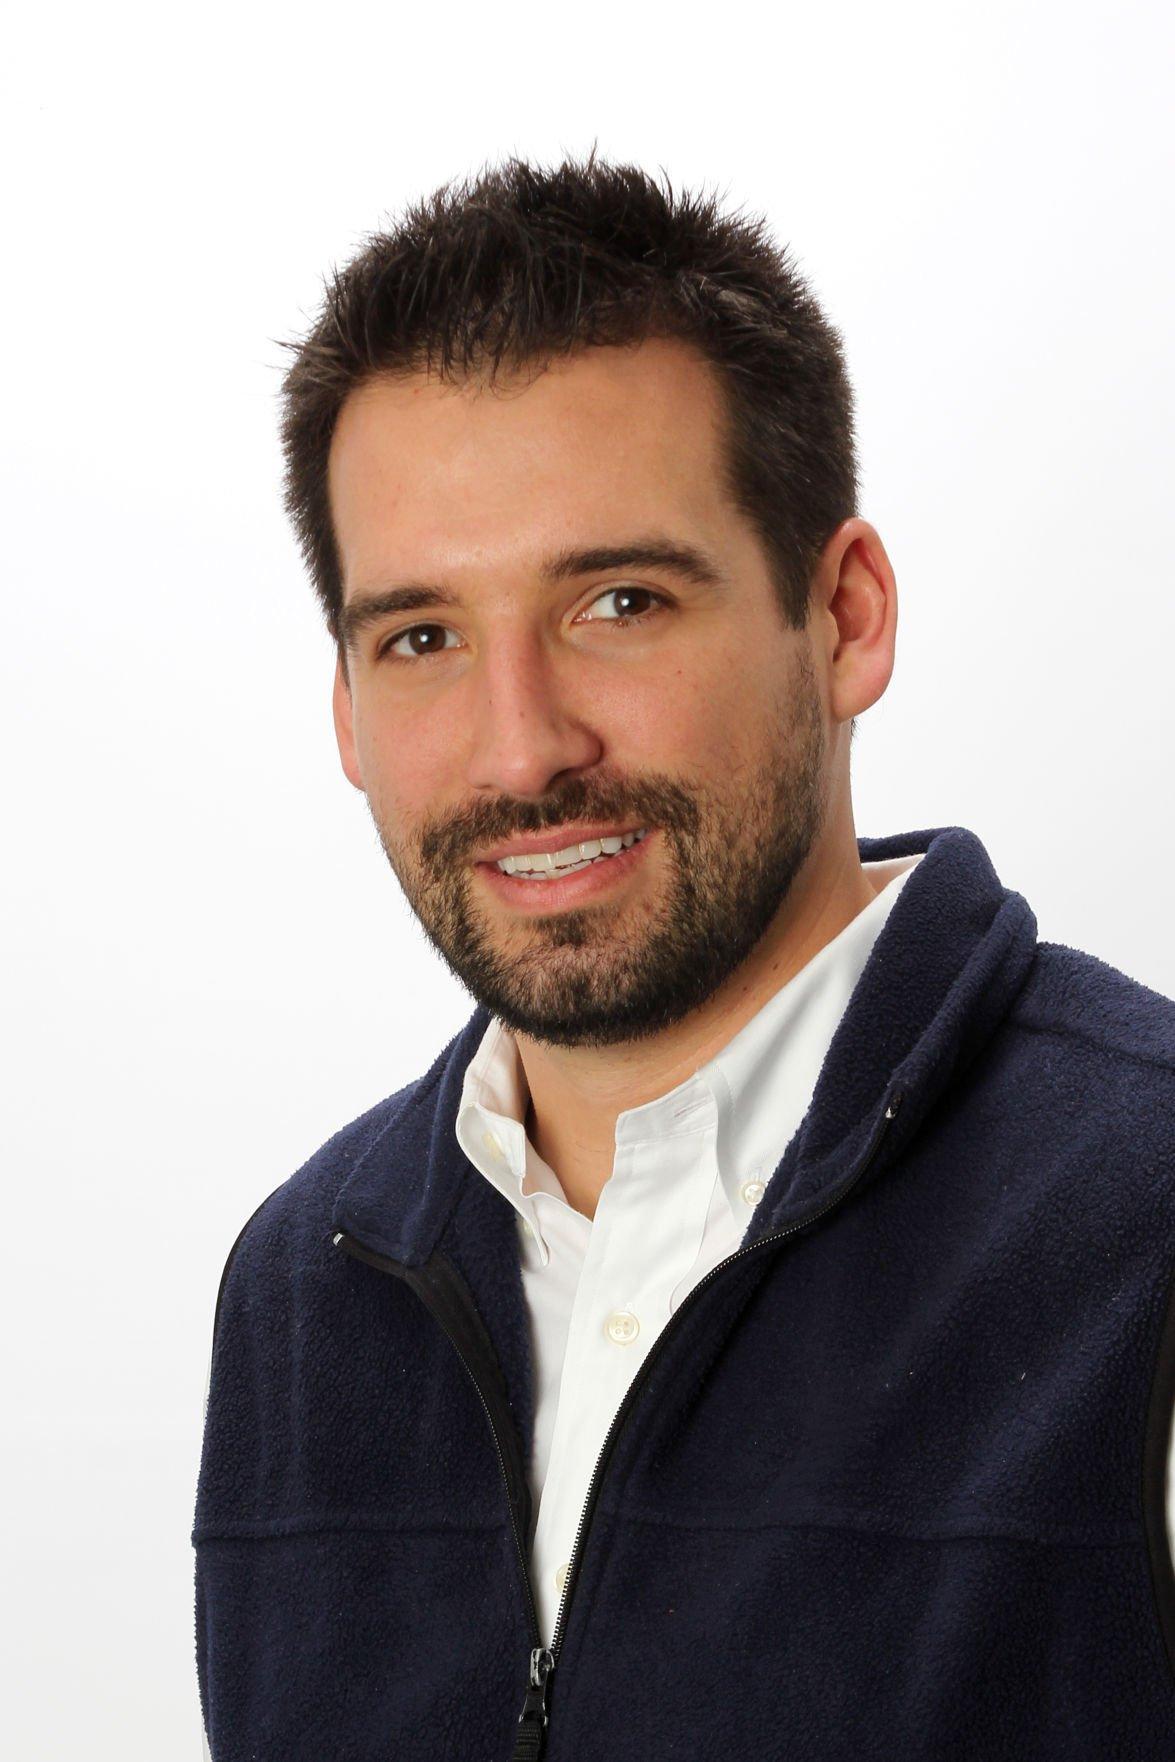 Eric Zagorsky